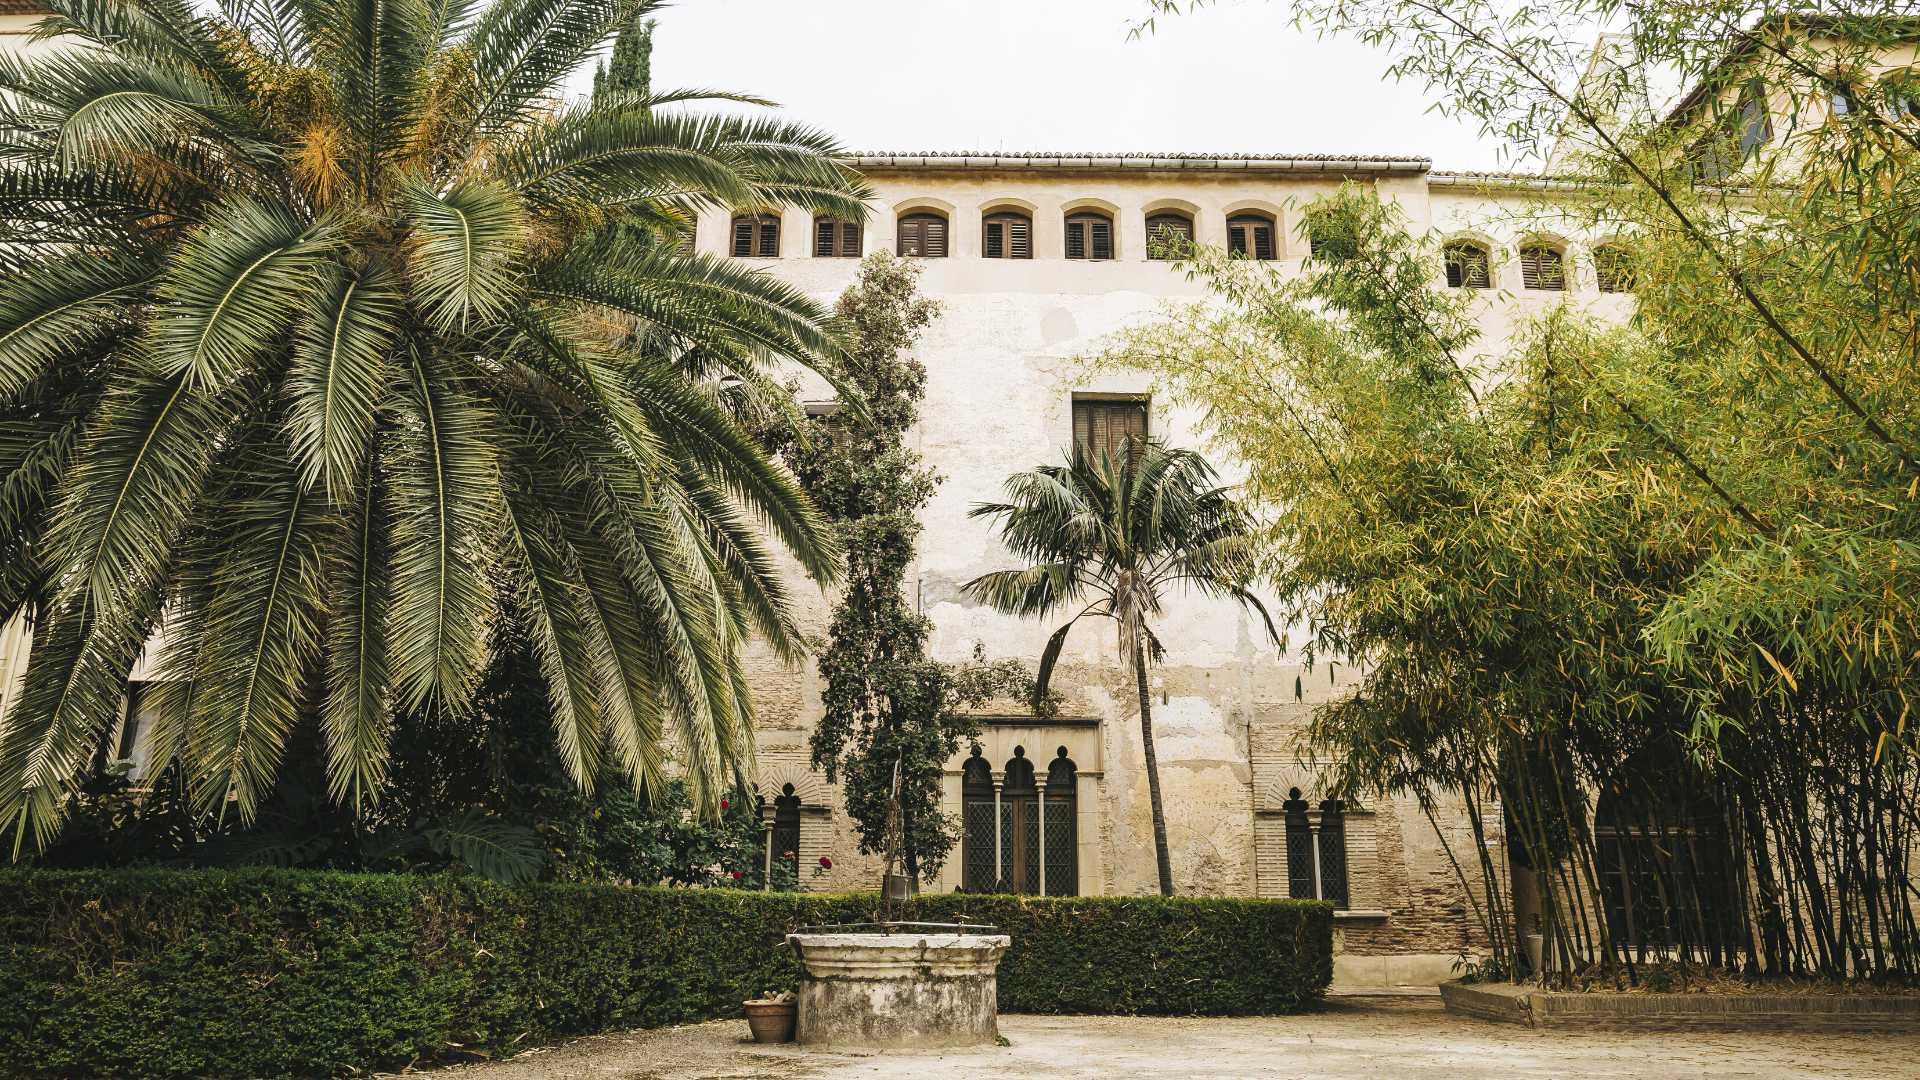 Visitas guiadas nocturnas: Palau Ducal de Gandia